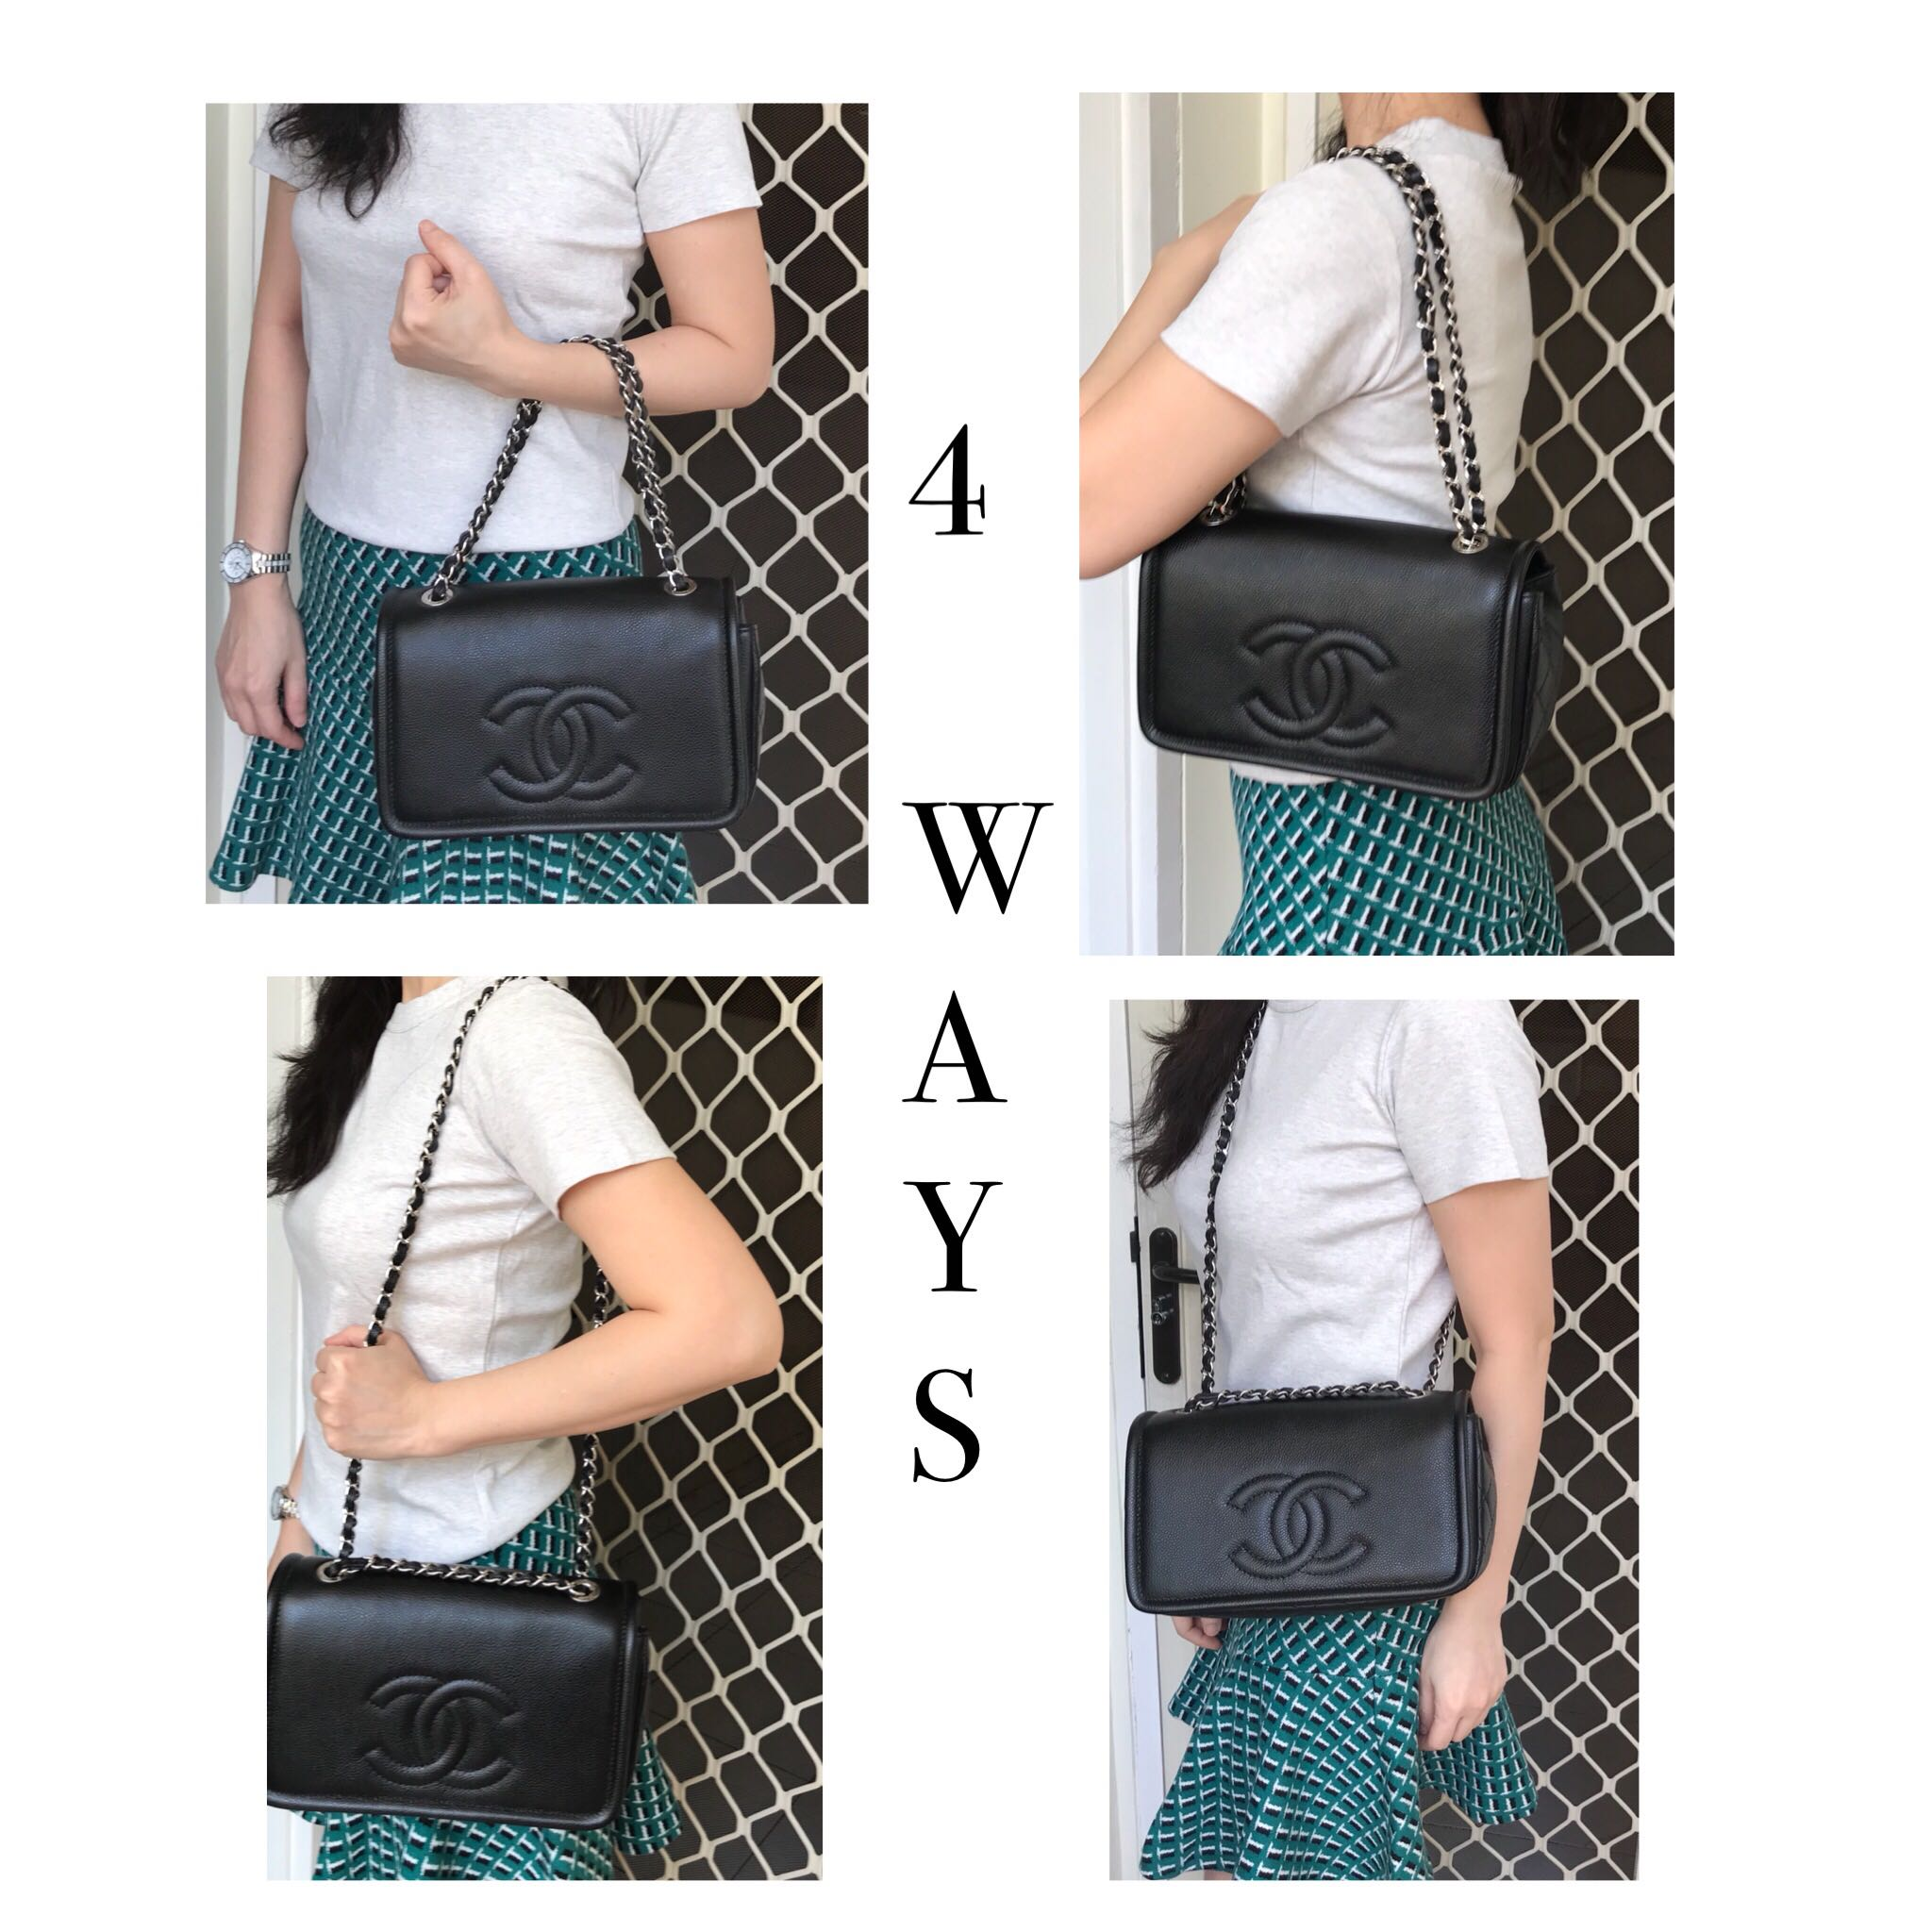 1ab2e6e3246c Chanel flap caviar shw # 15, Luxury, Bags & Wallets, Handbags on ...